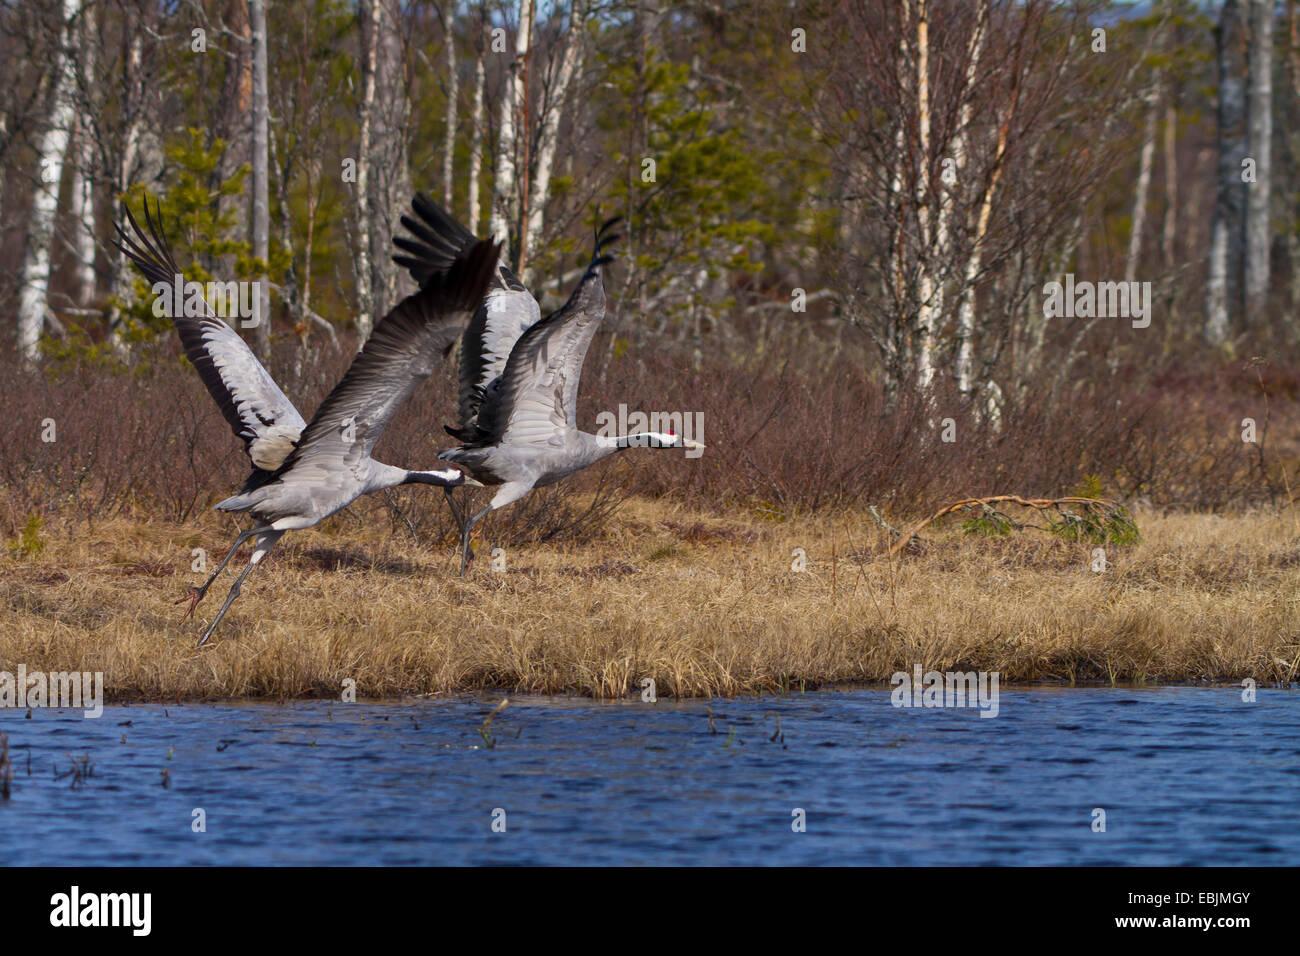 Common crane, Eurasian Crane (Grus grus), taking off couple at a lake, Sweden, Hamra National Park Stock Photo